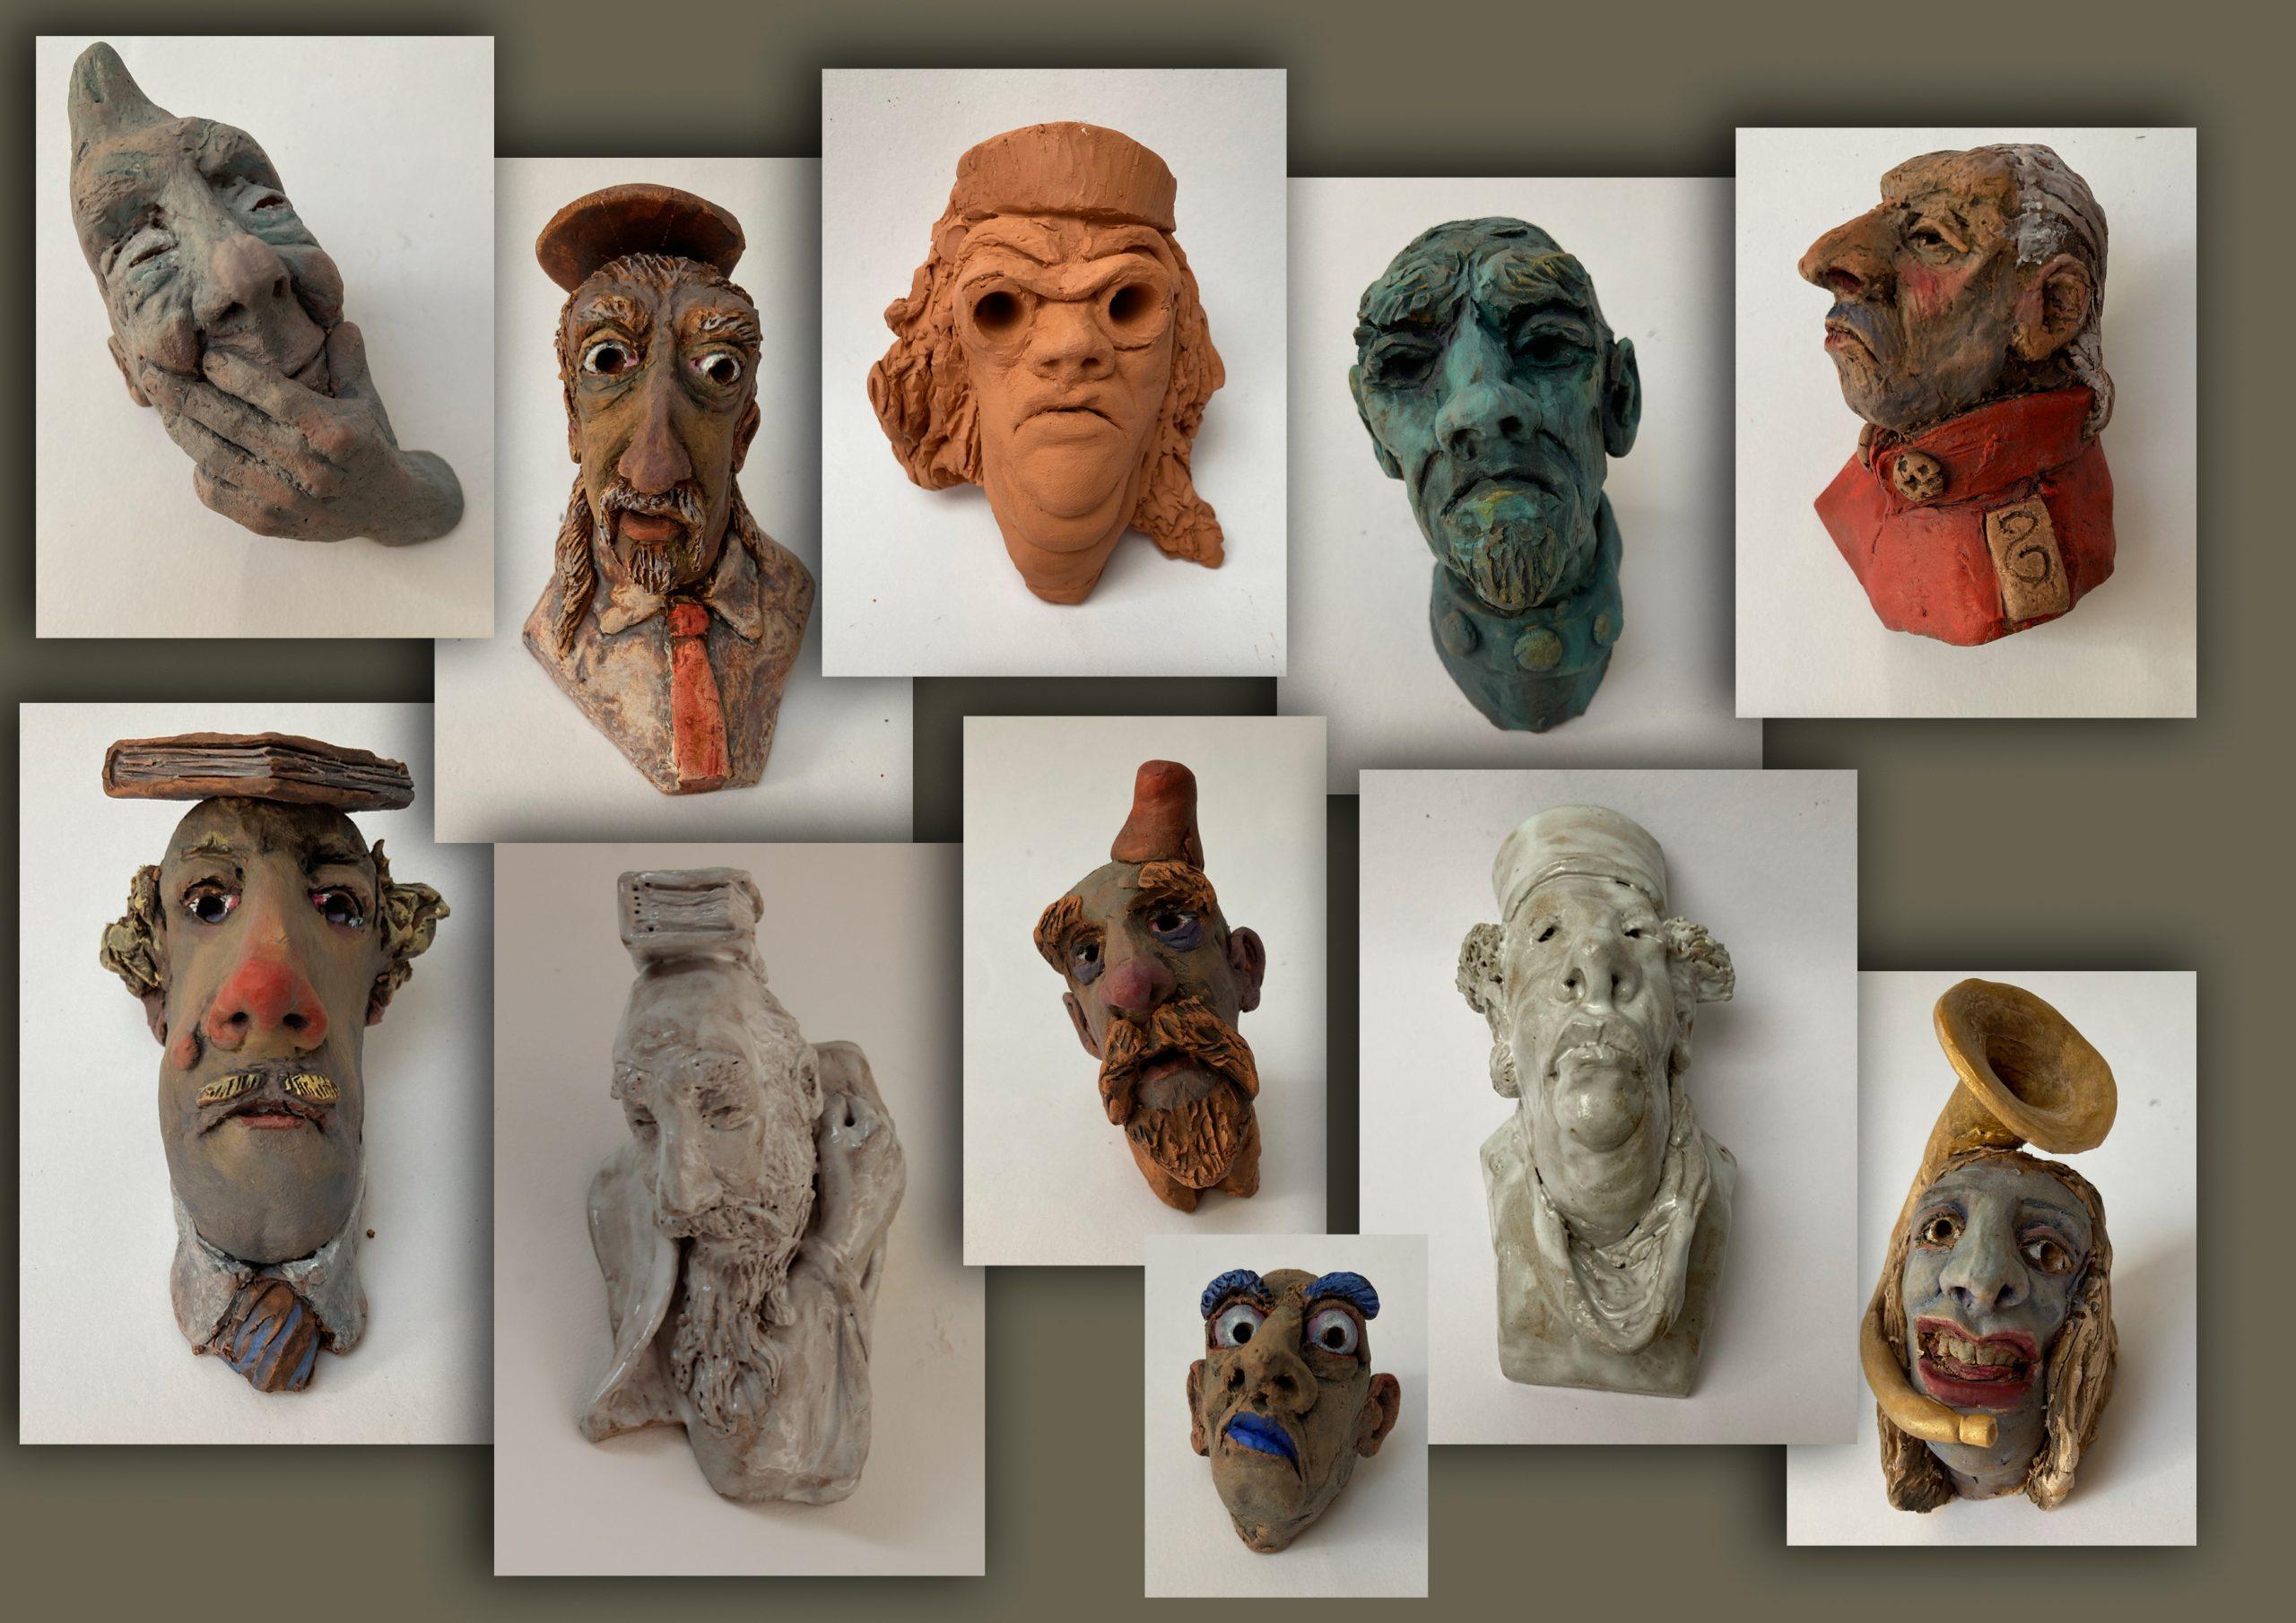 Gallery of Mind Gargoyles